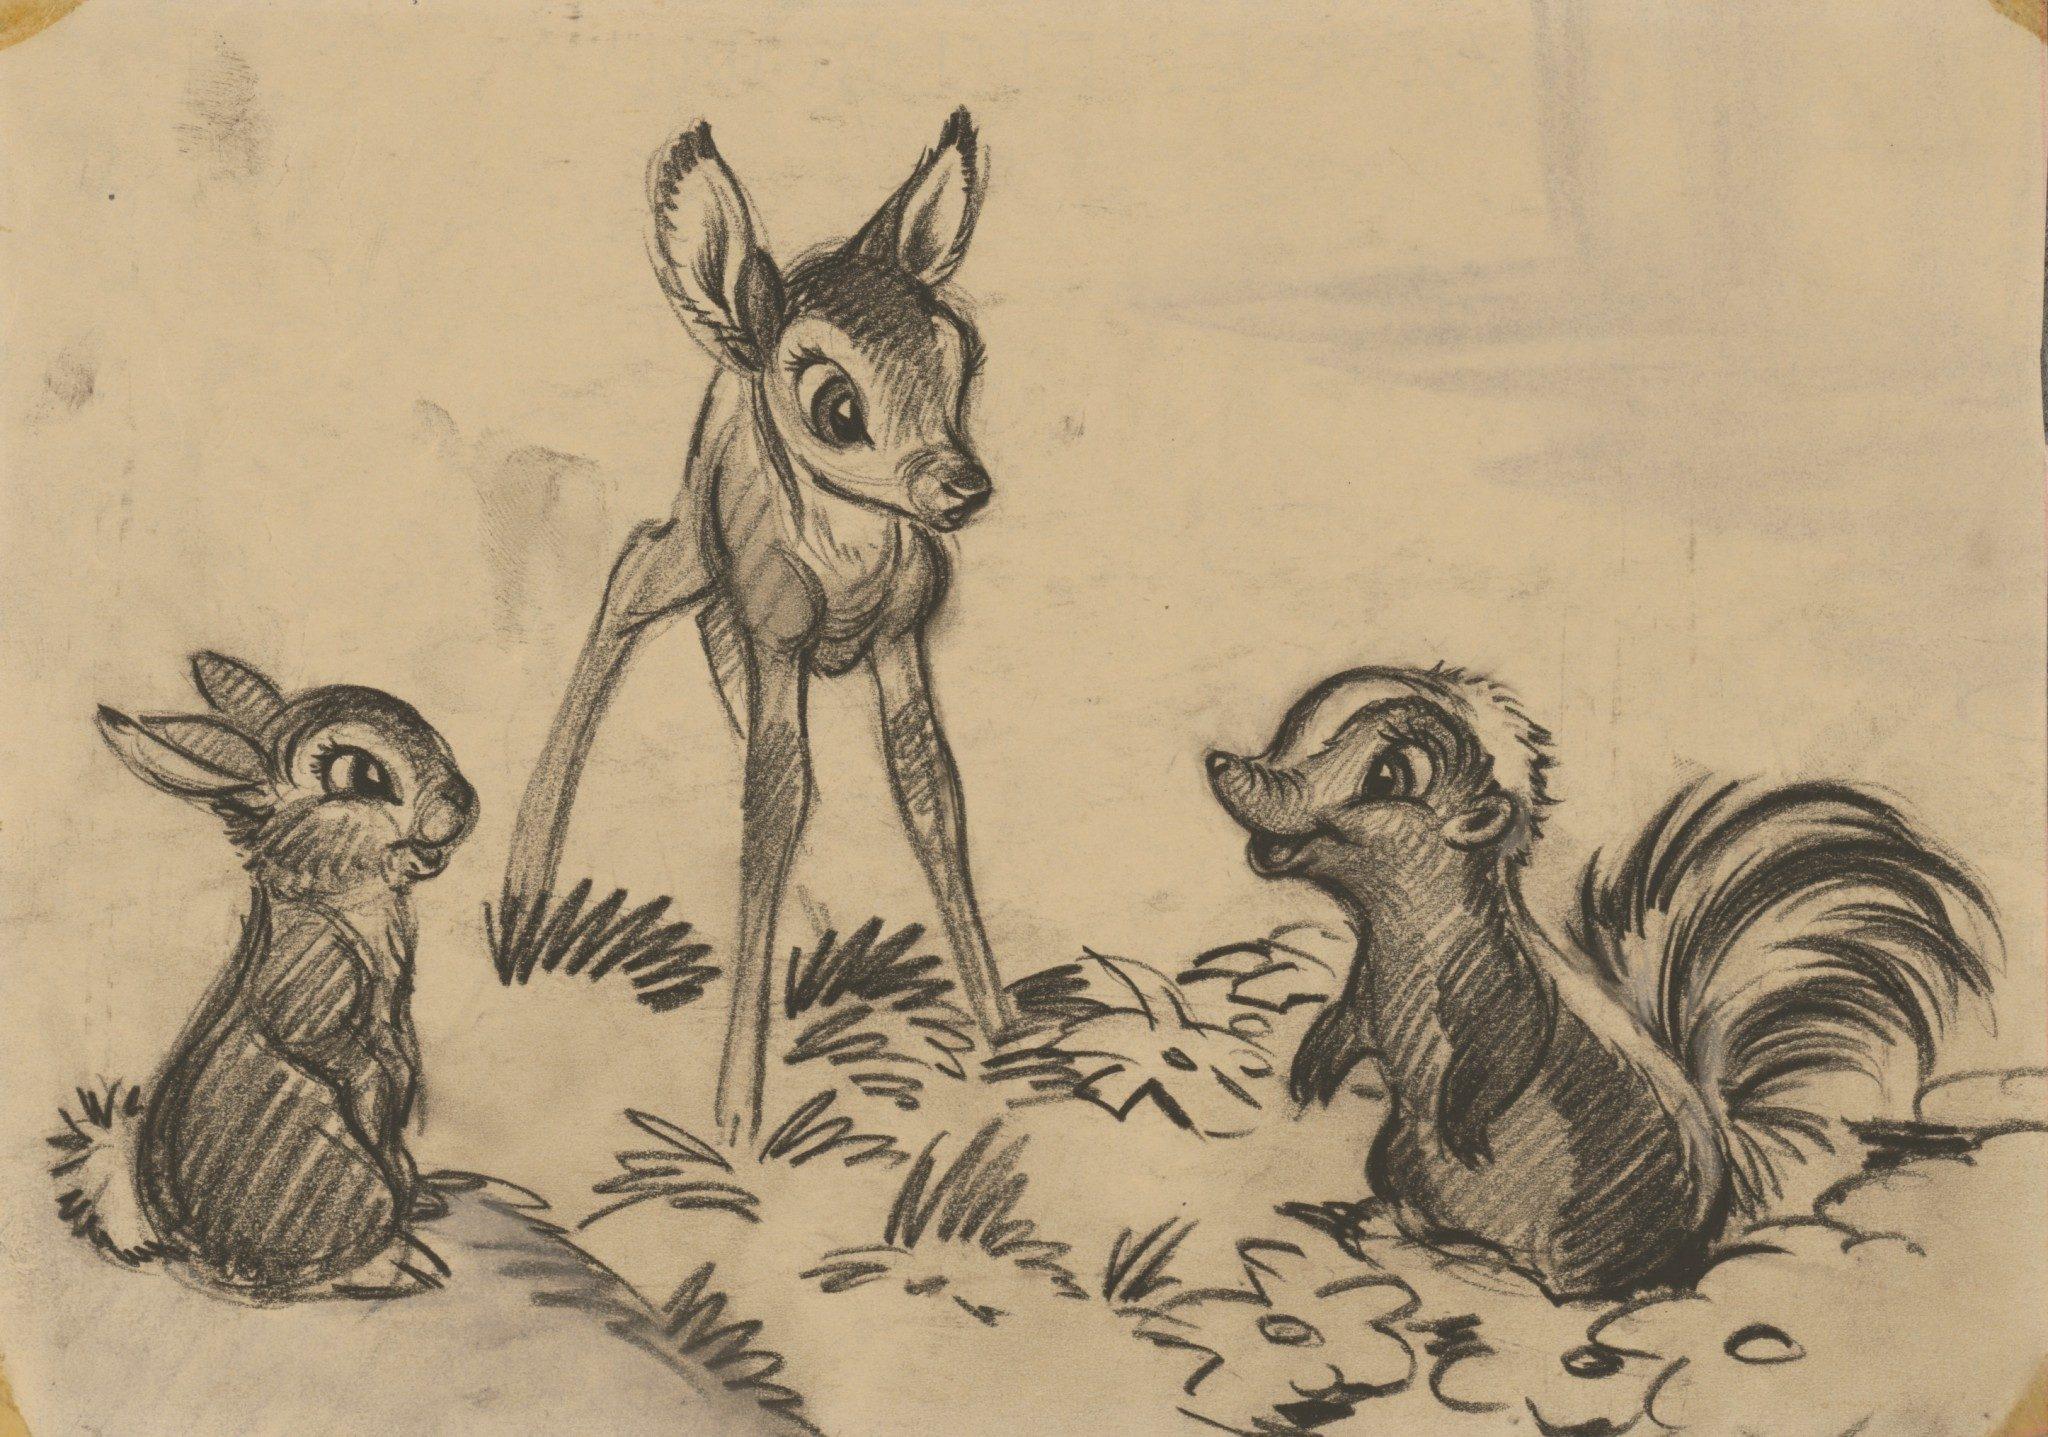 L'art des studios d'animation Walt Disney